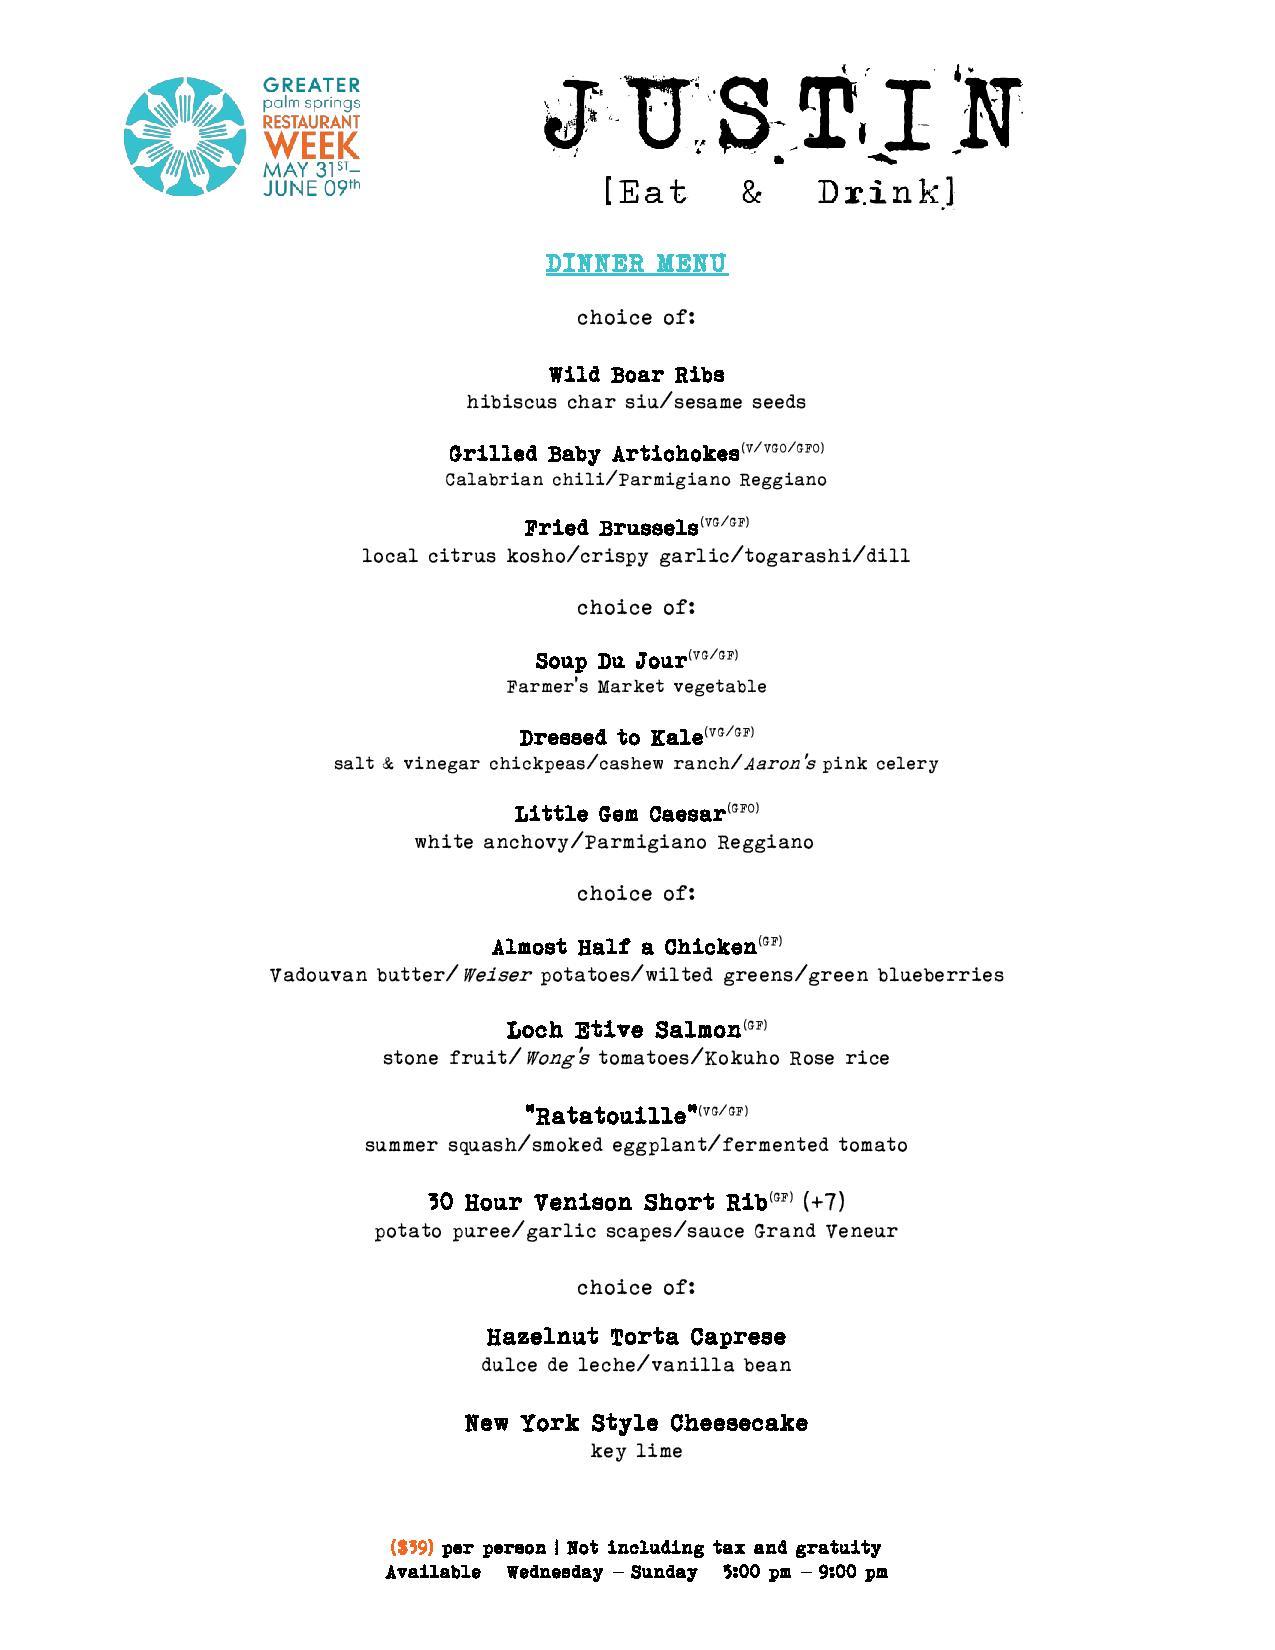 (menu subject to change)